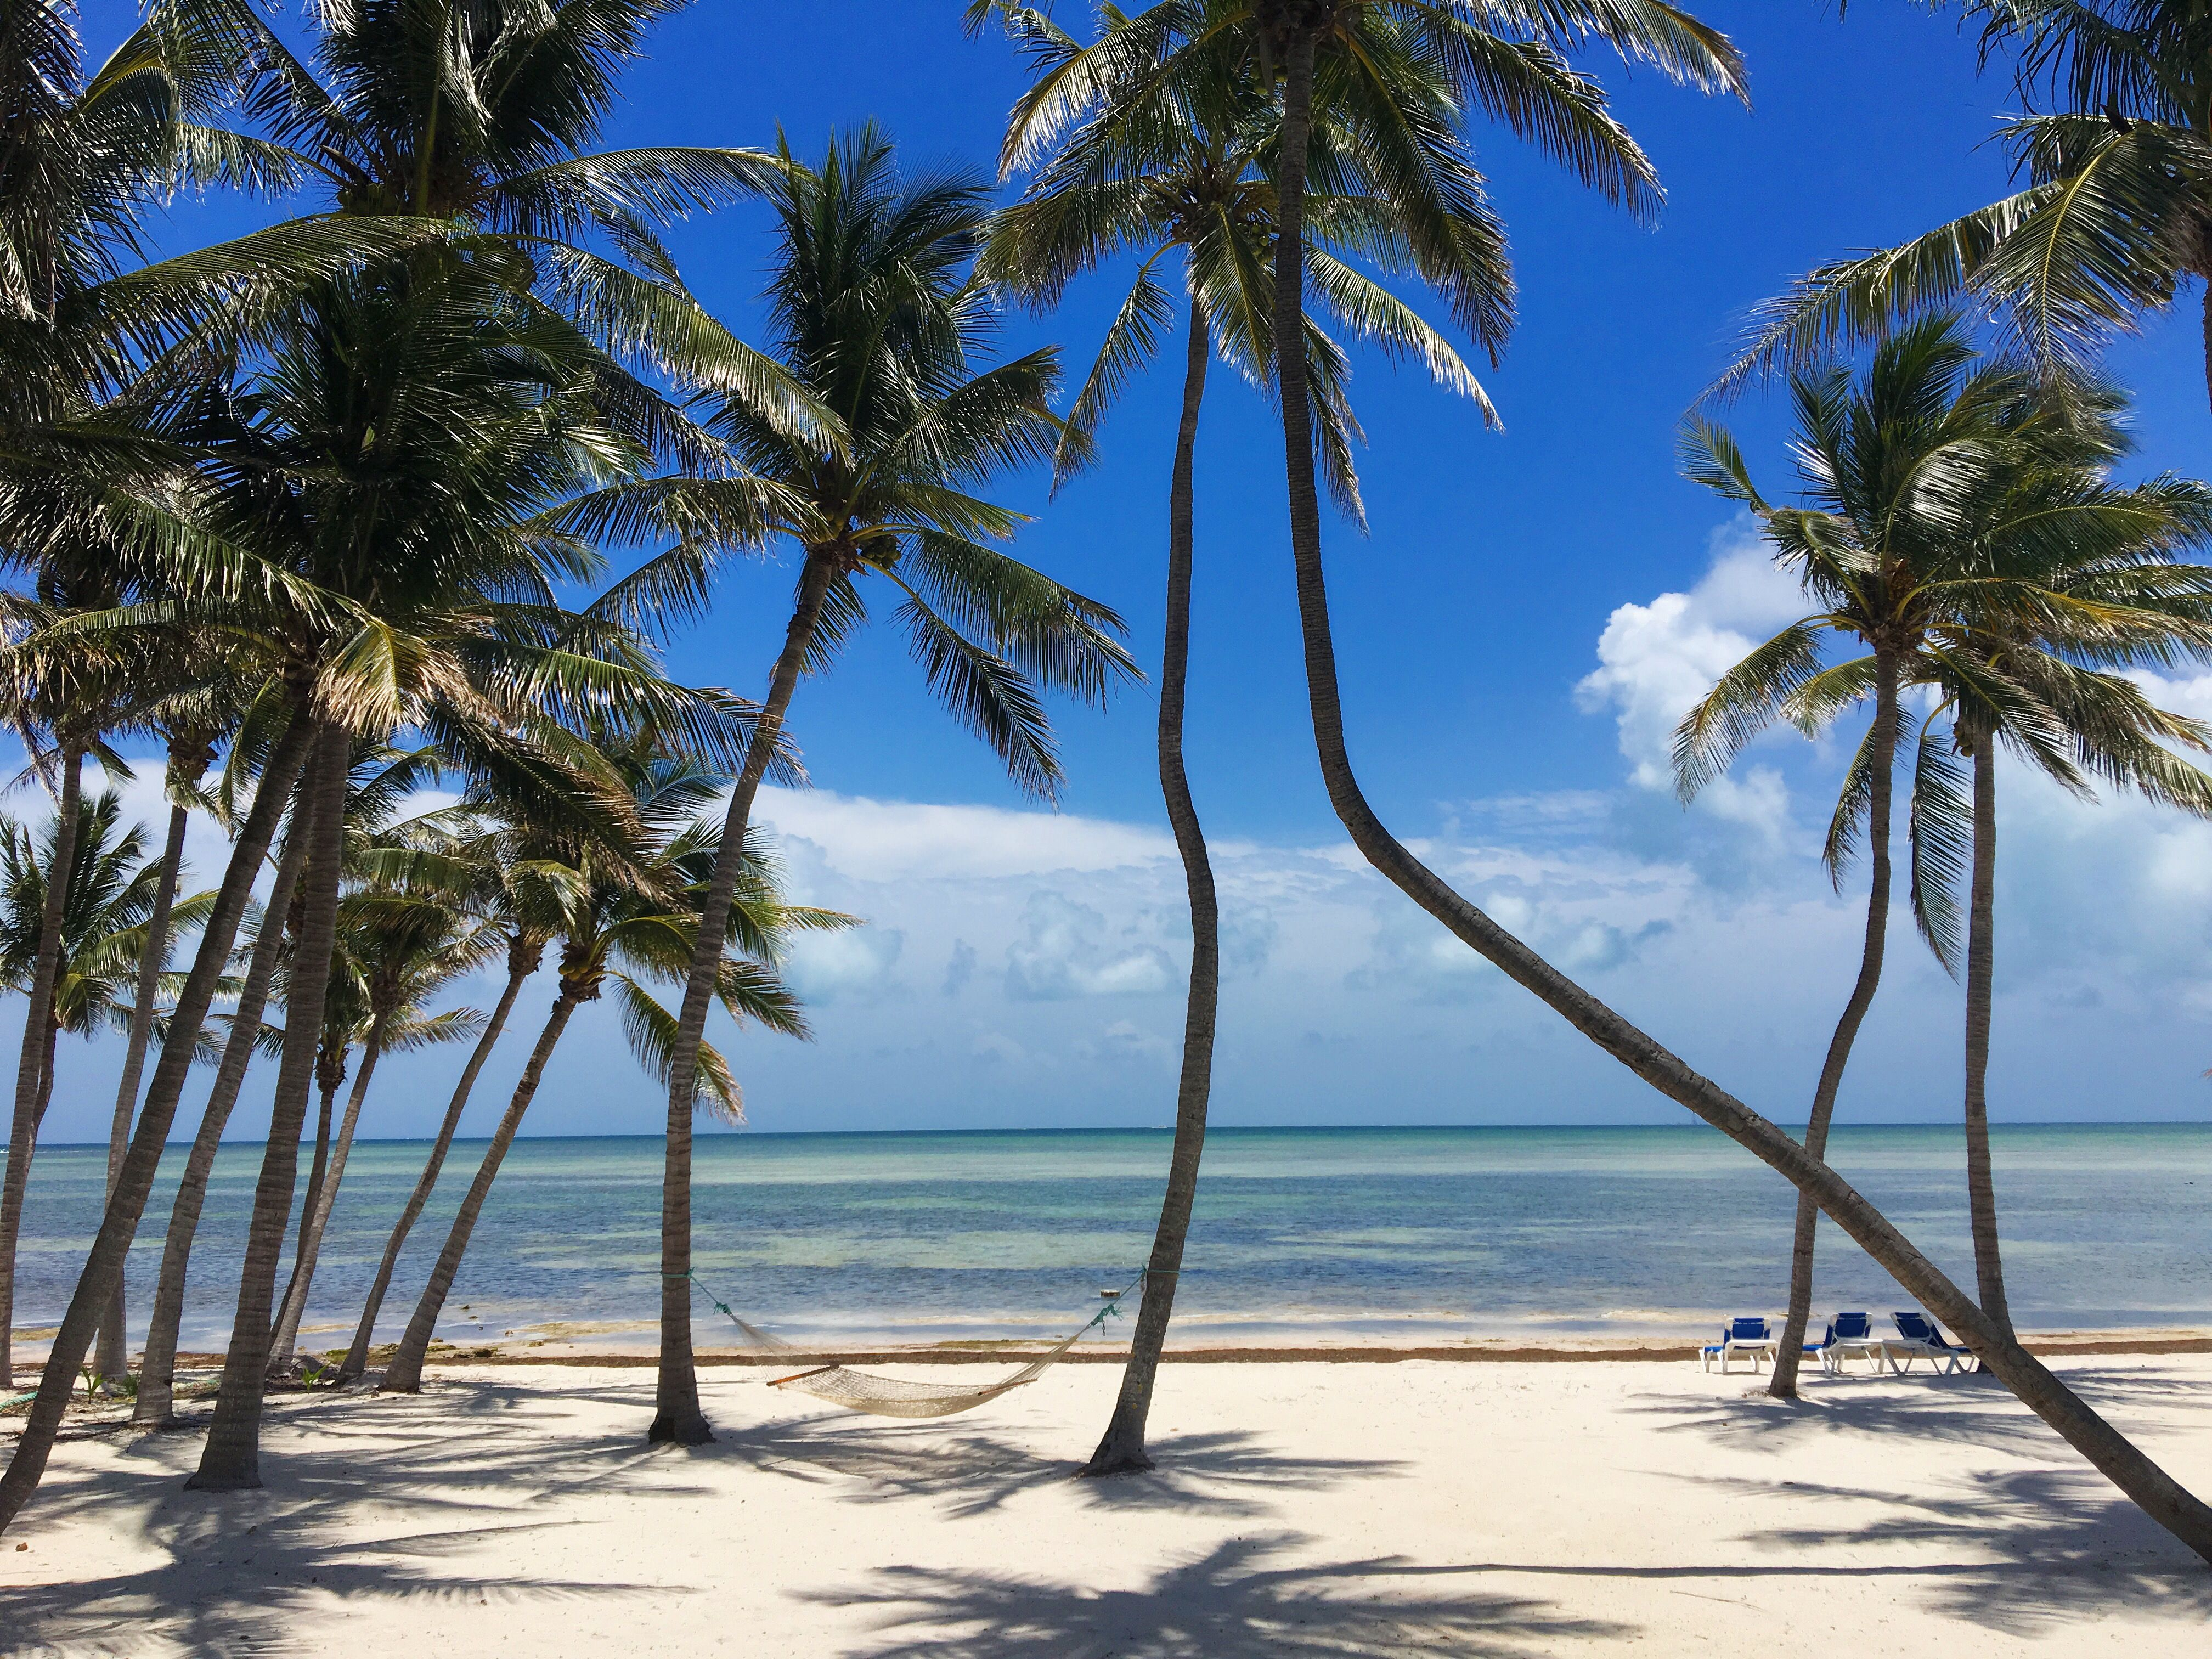 green turtle beach estate islamorada florida keys island rh pinterest com